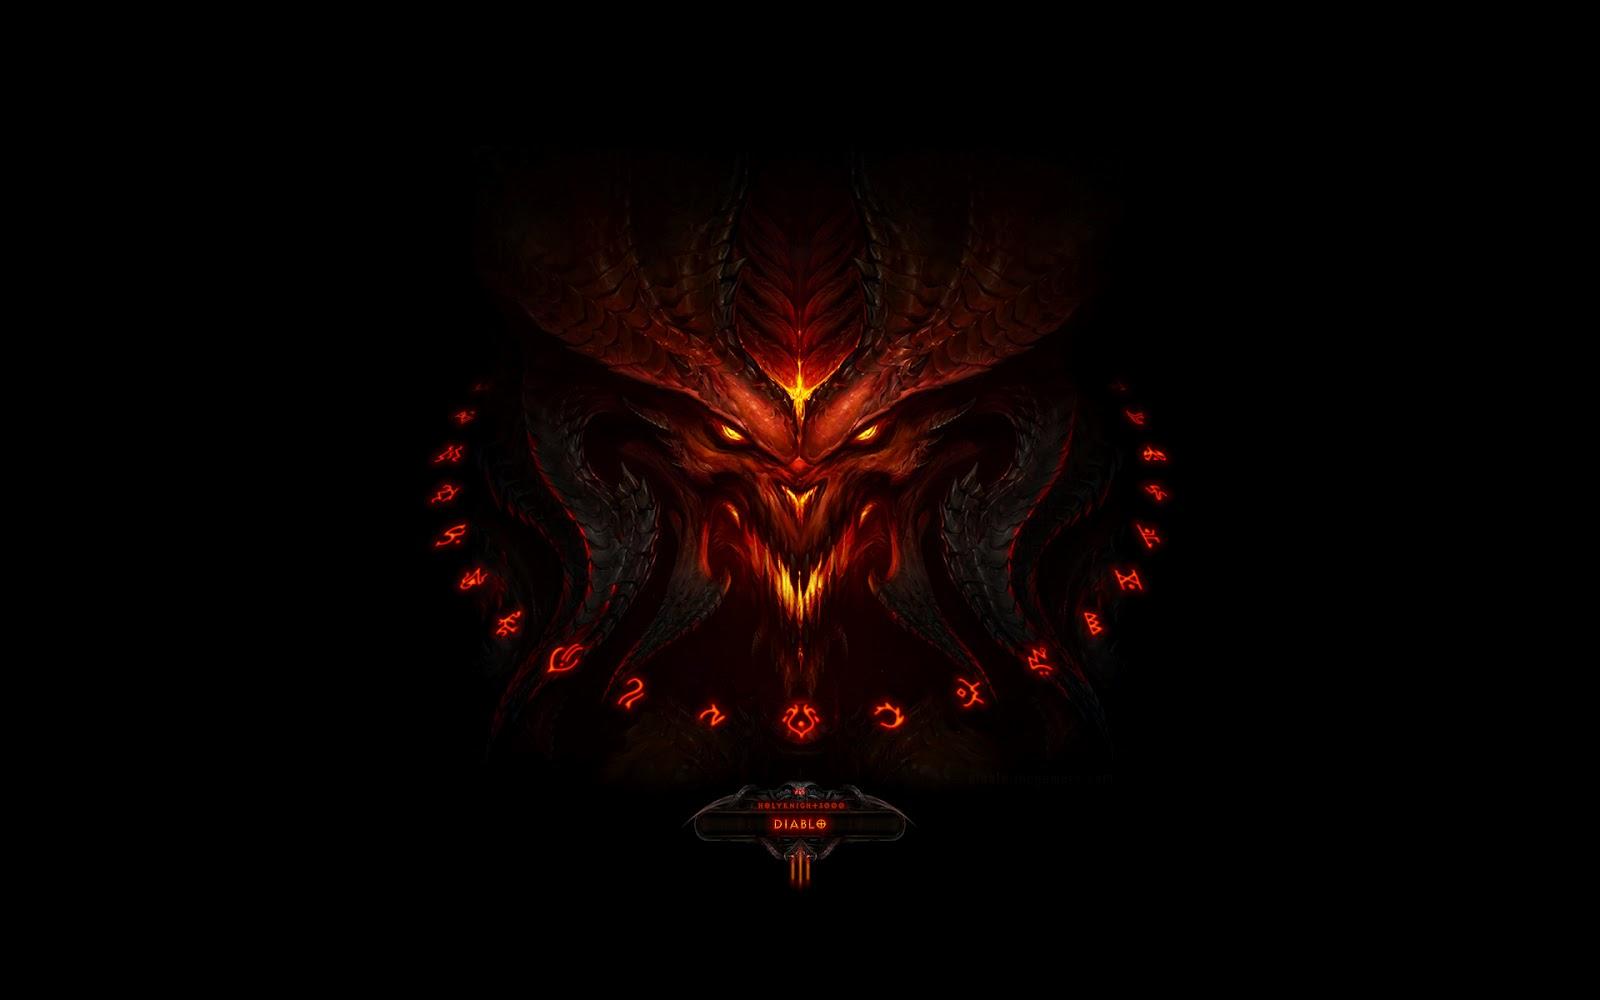 wallpaper: Diablo 3 Hd Wallpaper